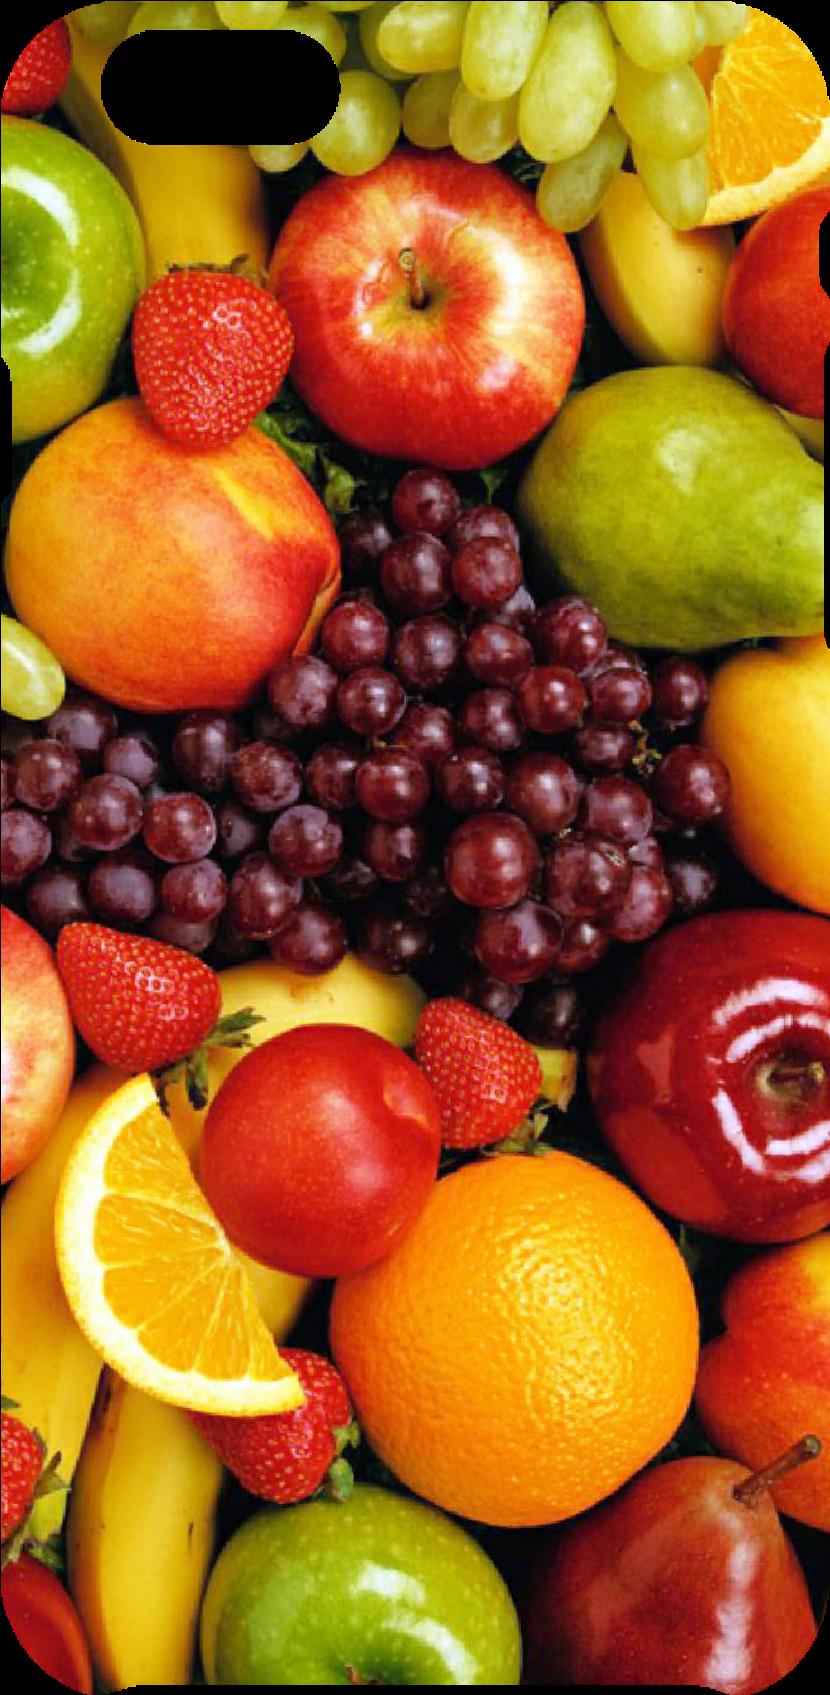 cover tutti frutti!